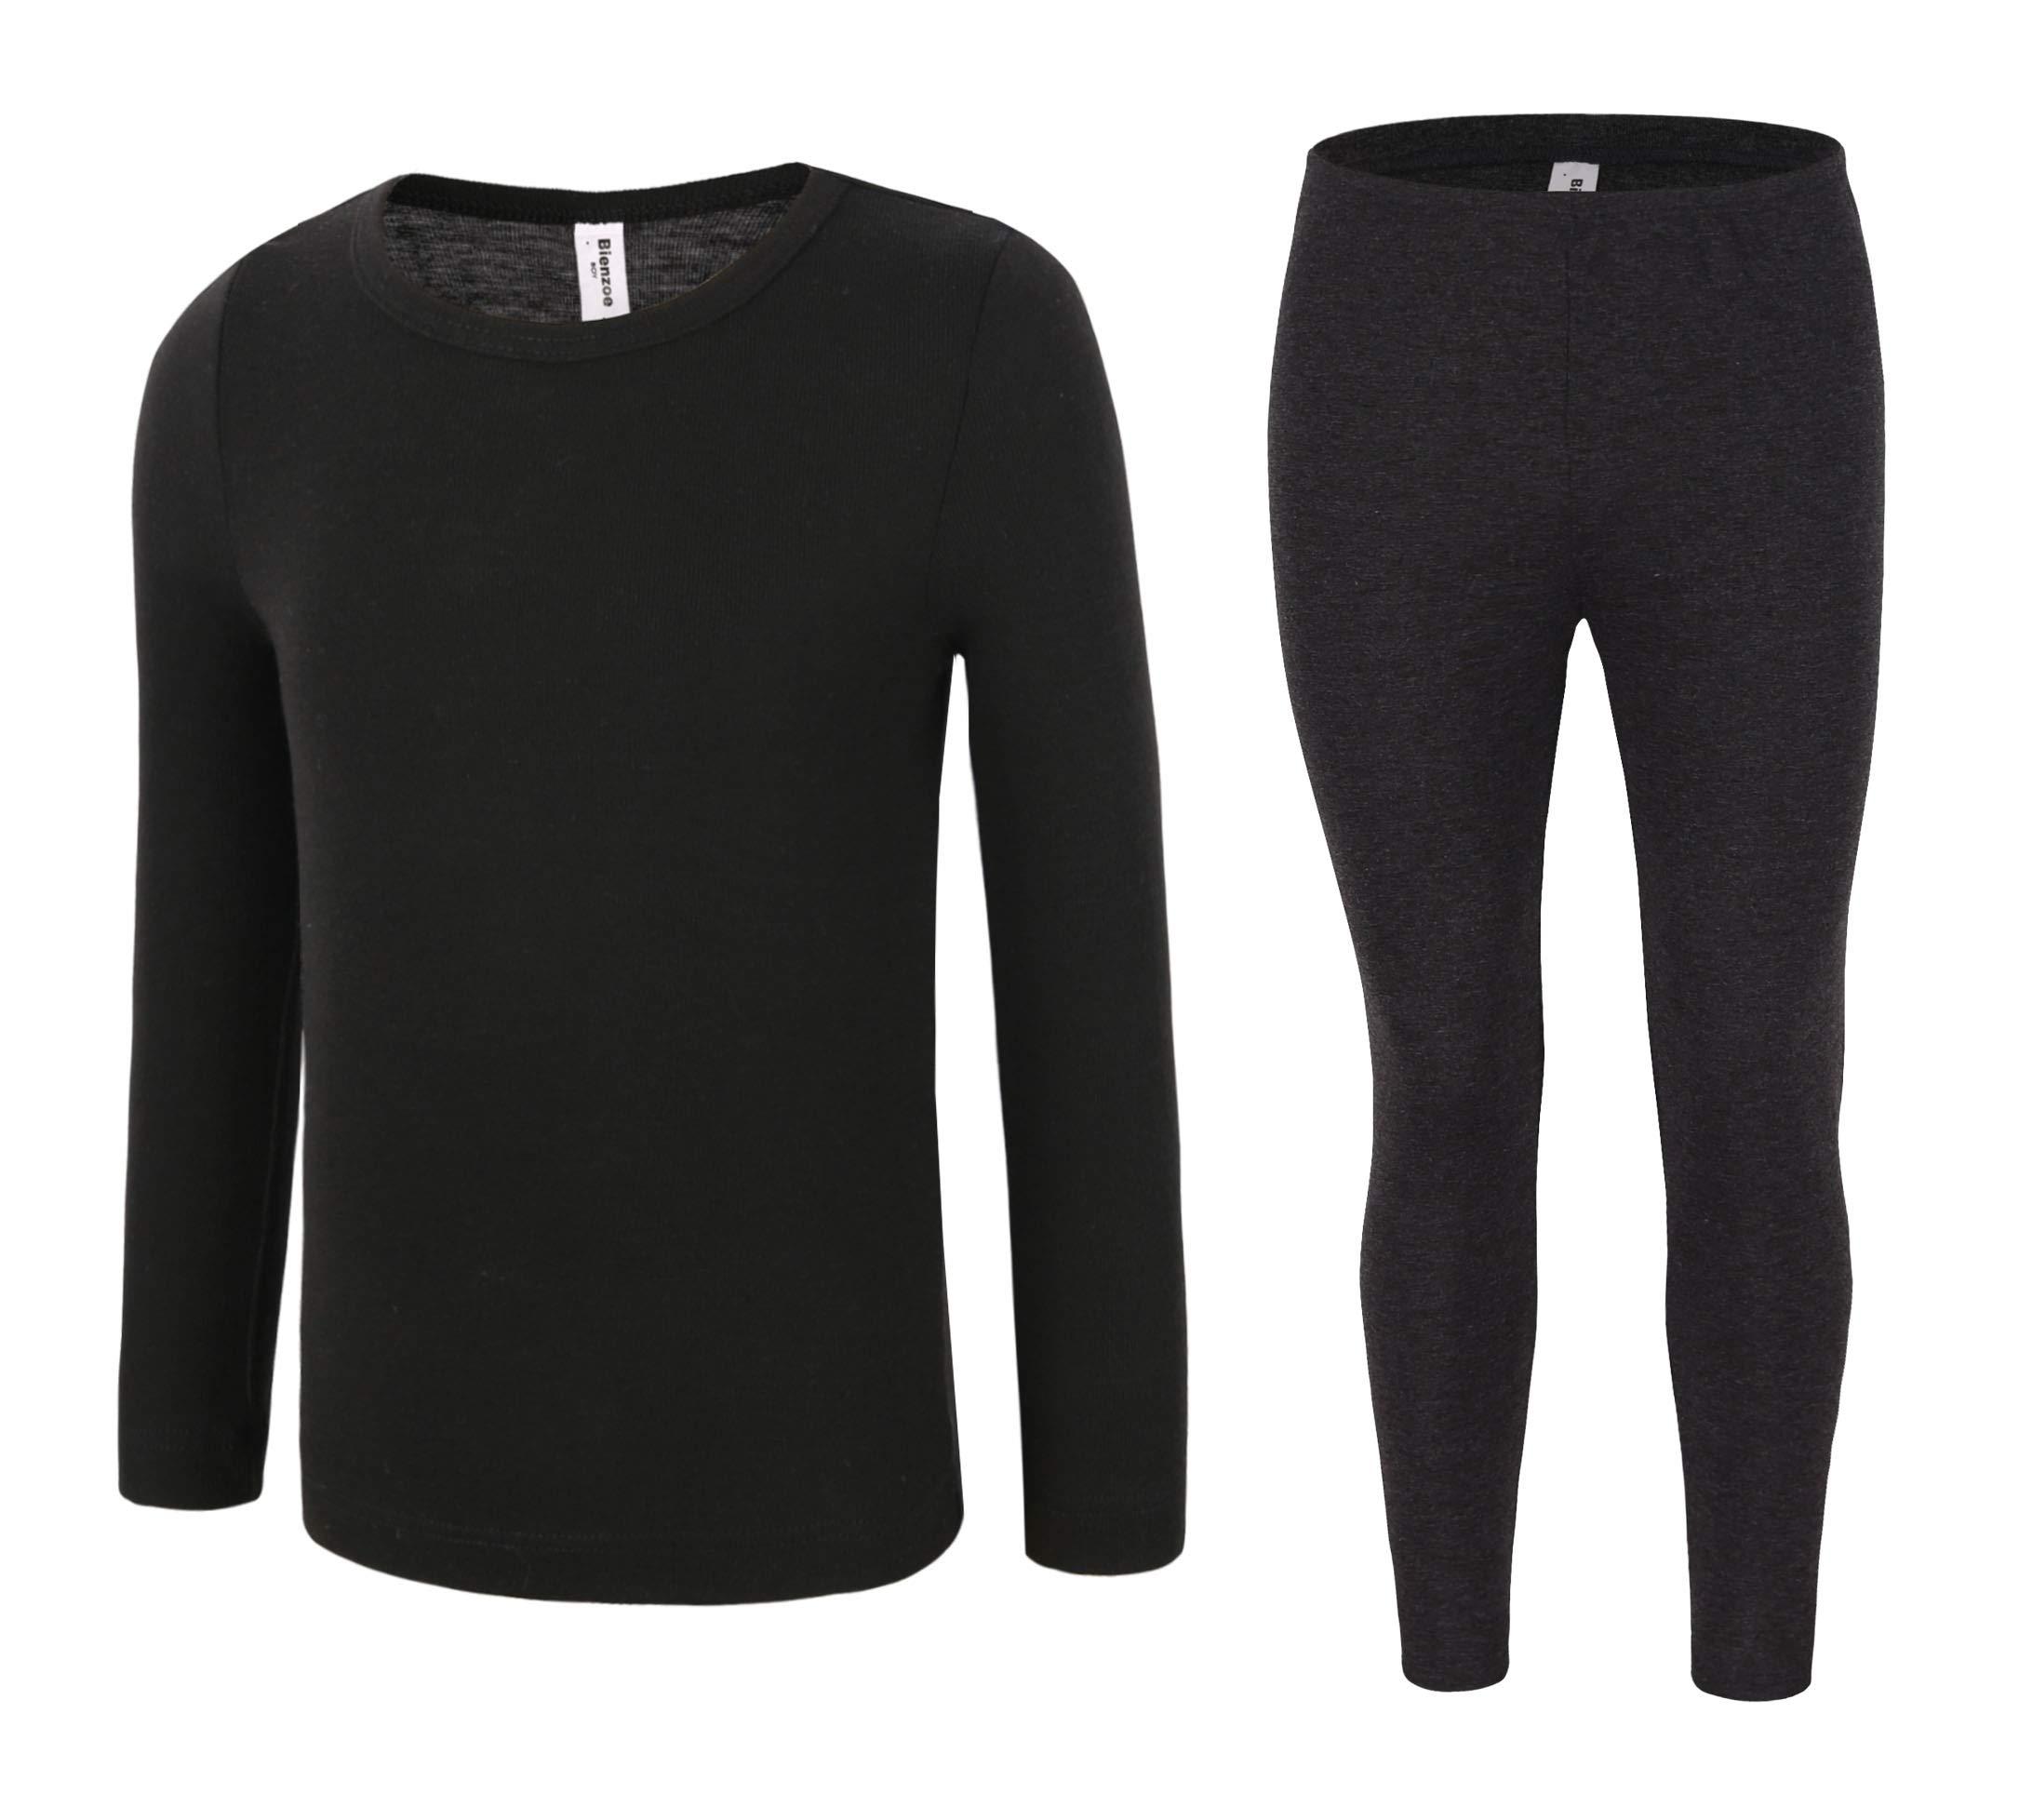 Bienzoe Boy's High Tech Fiber Thermals Long Johns Tops & Pants Set 12/14 Black by Bienzoe